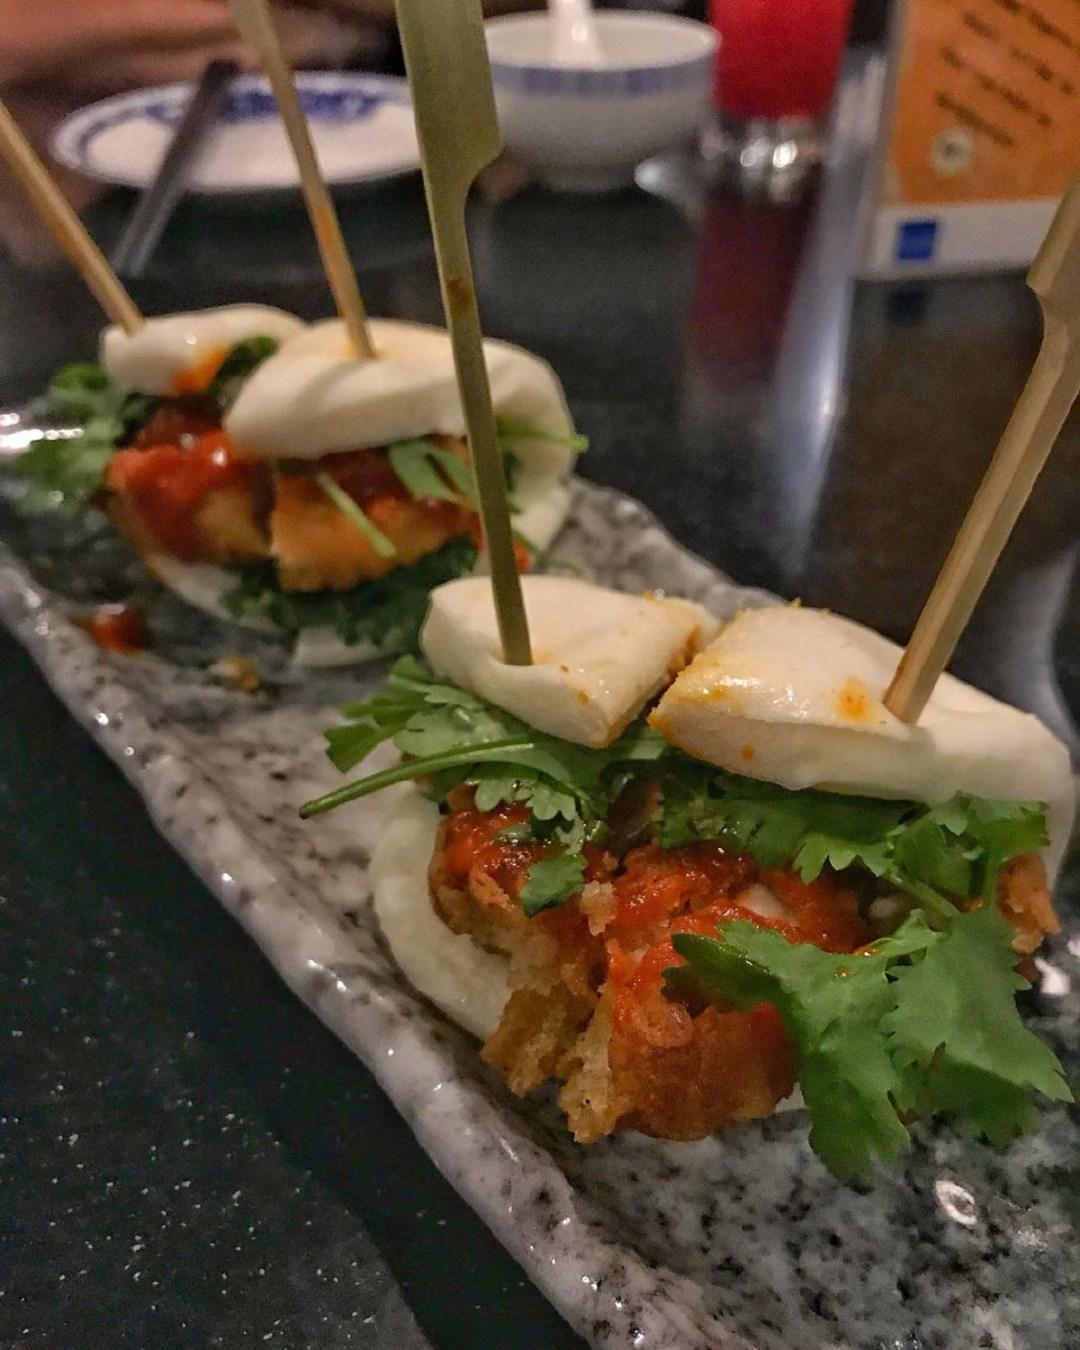 Unique Bao - Pork cracklins bao